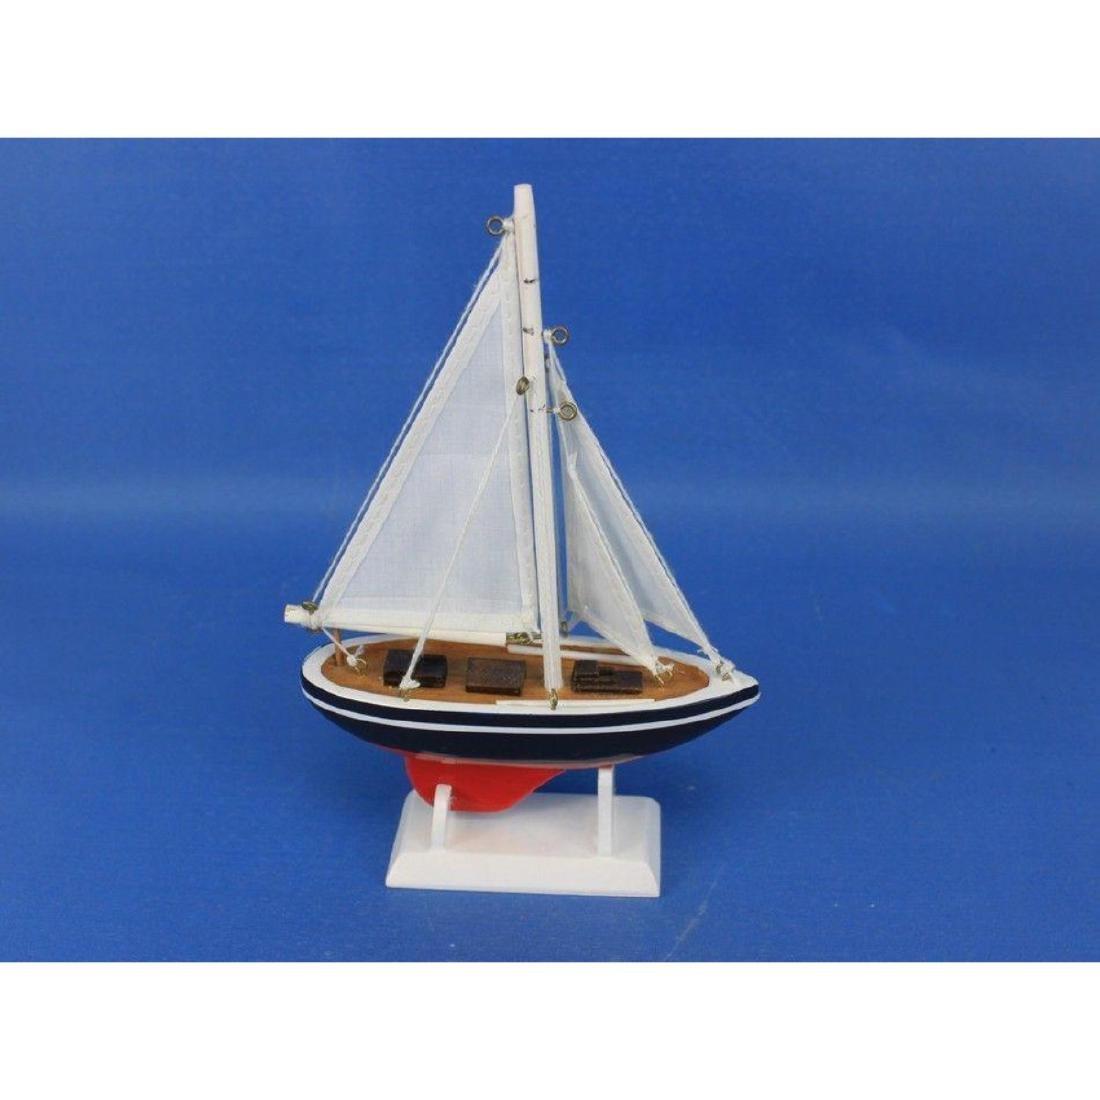 "Wooden American Sailer Model Sailboat Decoration 9"" - 5"